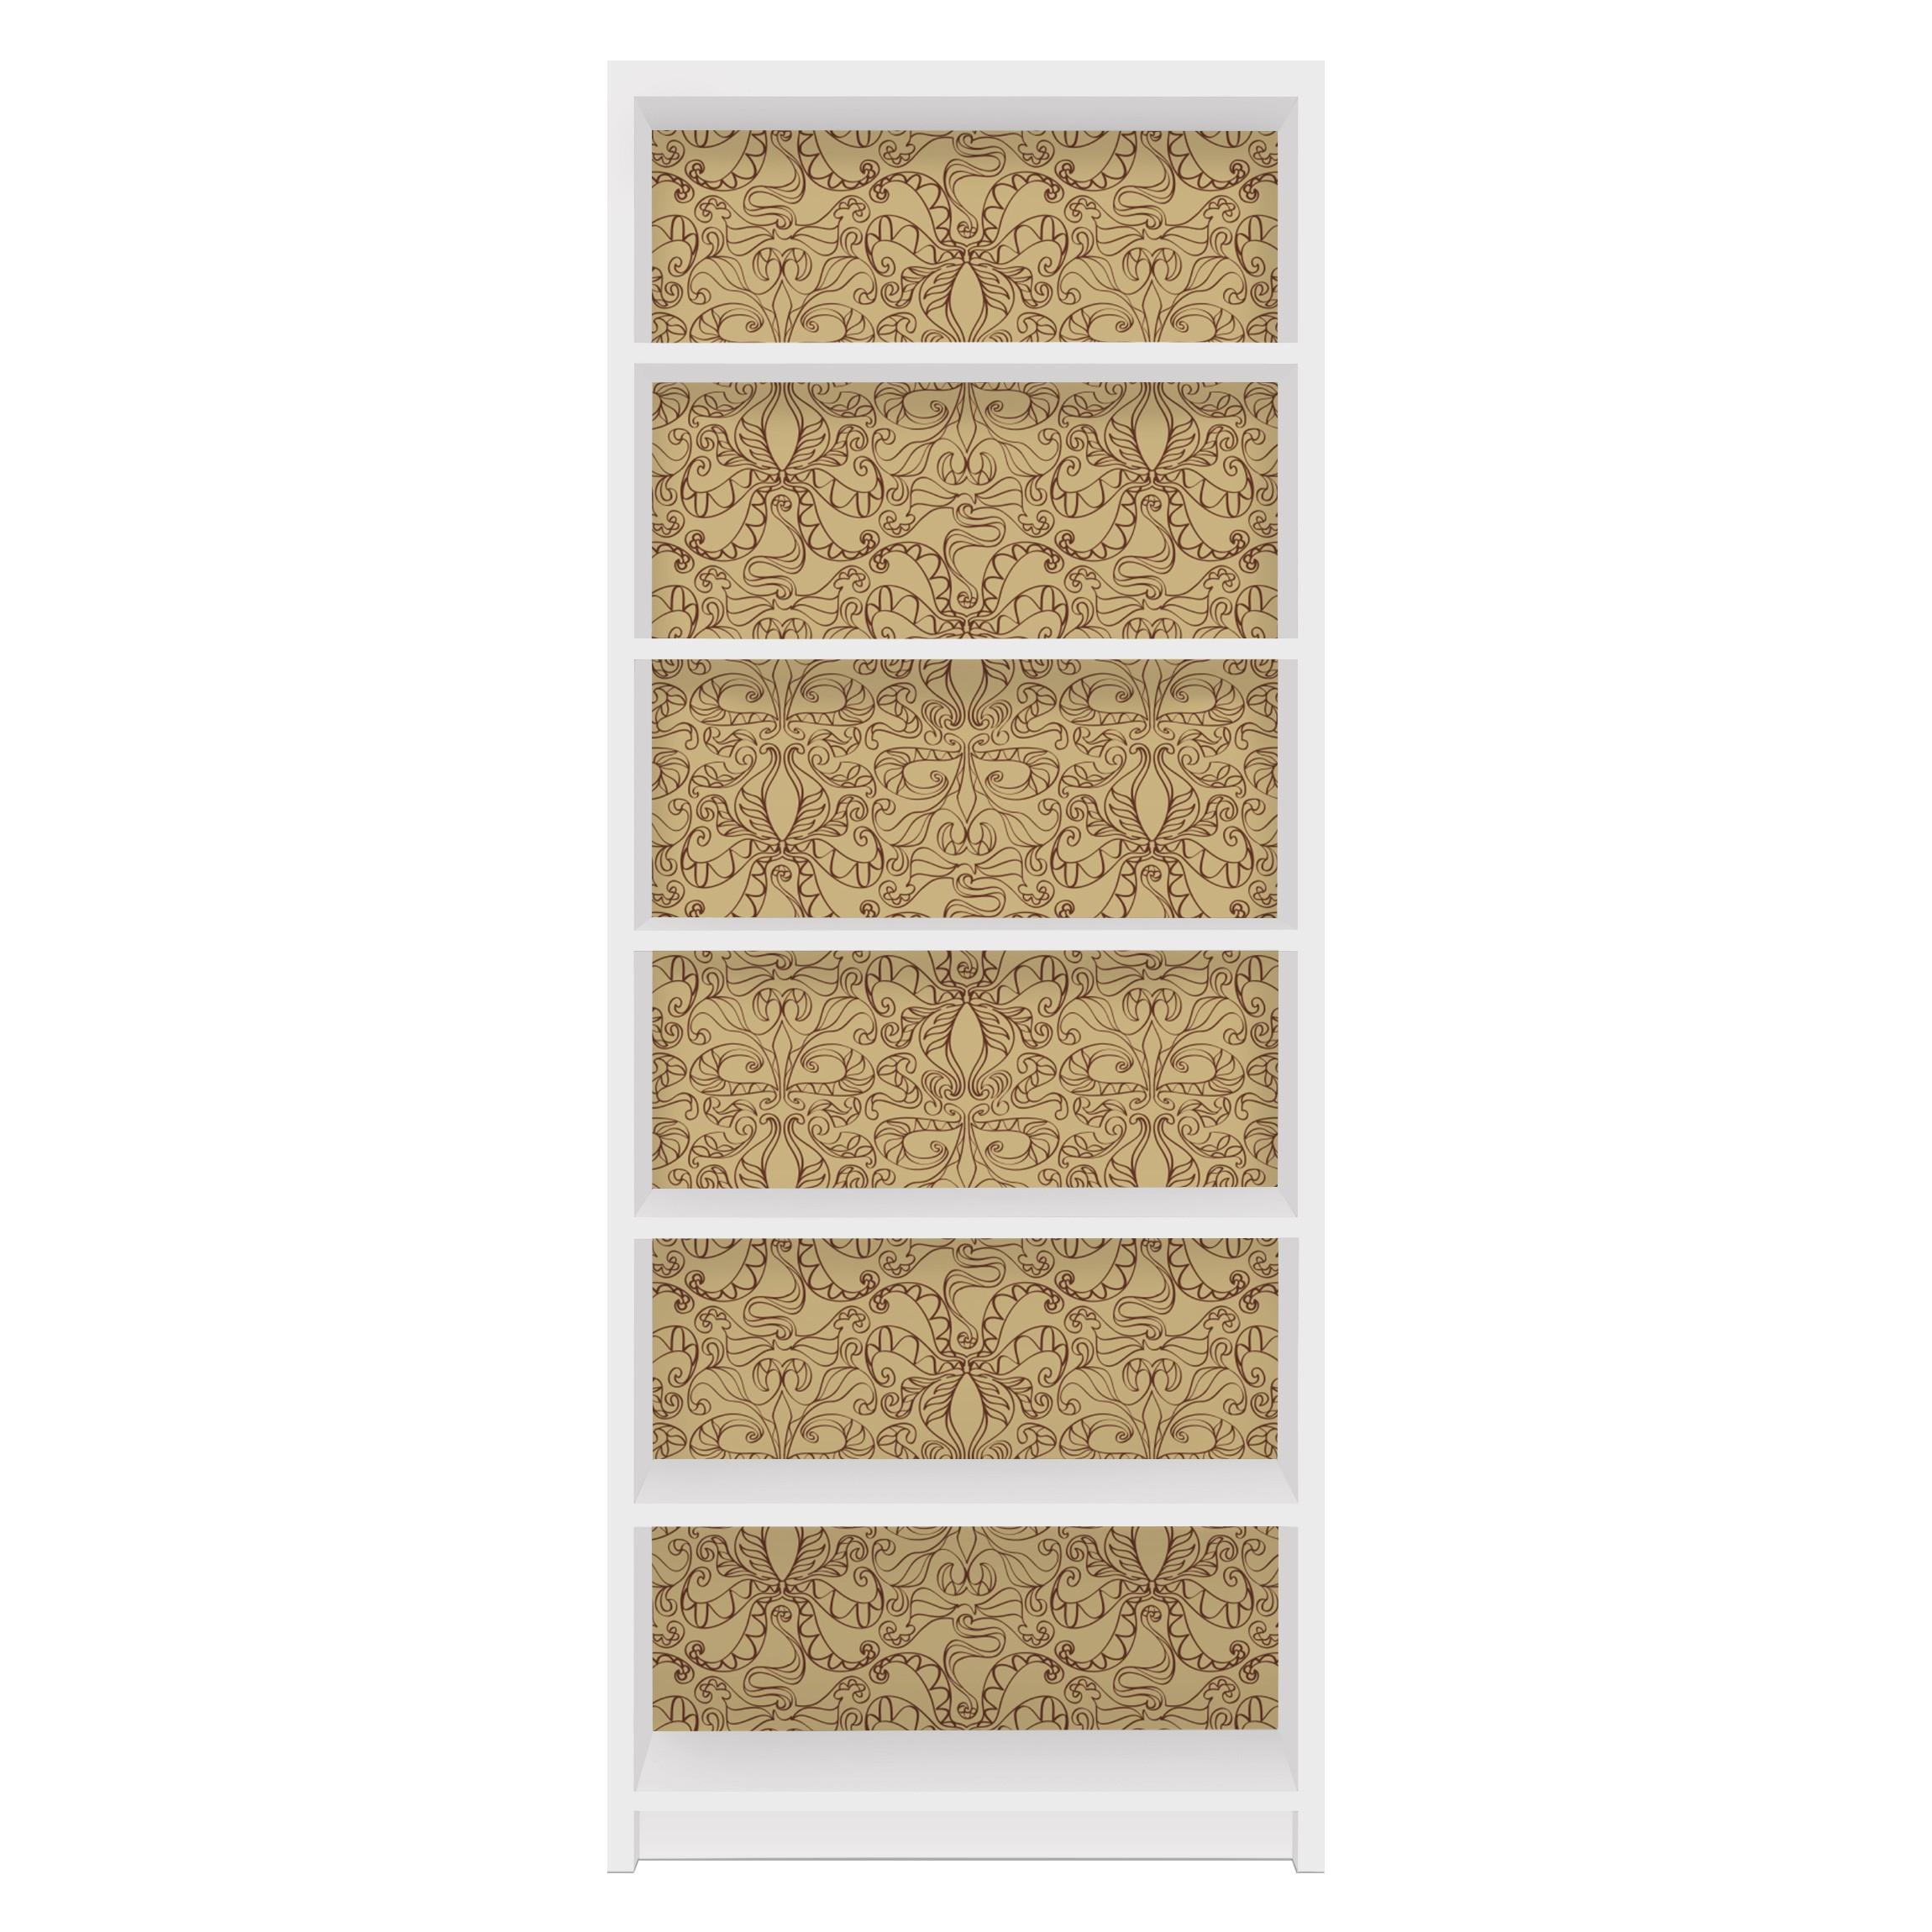 m belfolie f r ikea billy regal klebefolie spirituelles muster beige. Black Bedroom Furniture Sets. Home Design Ideas